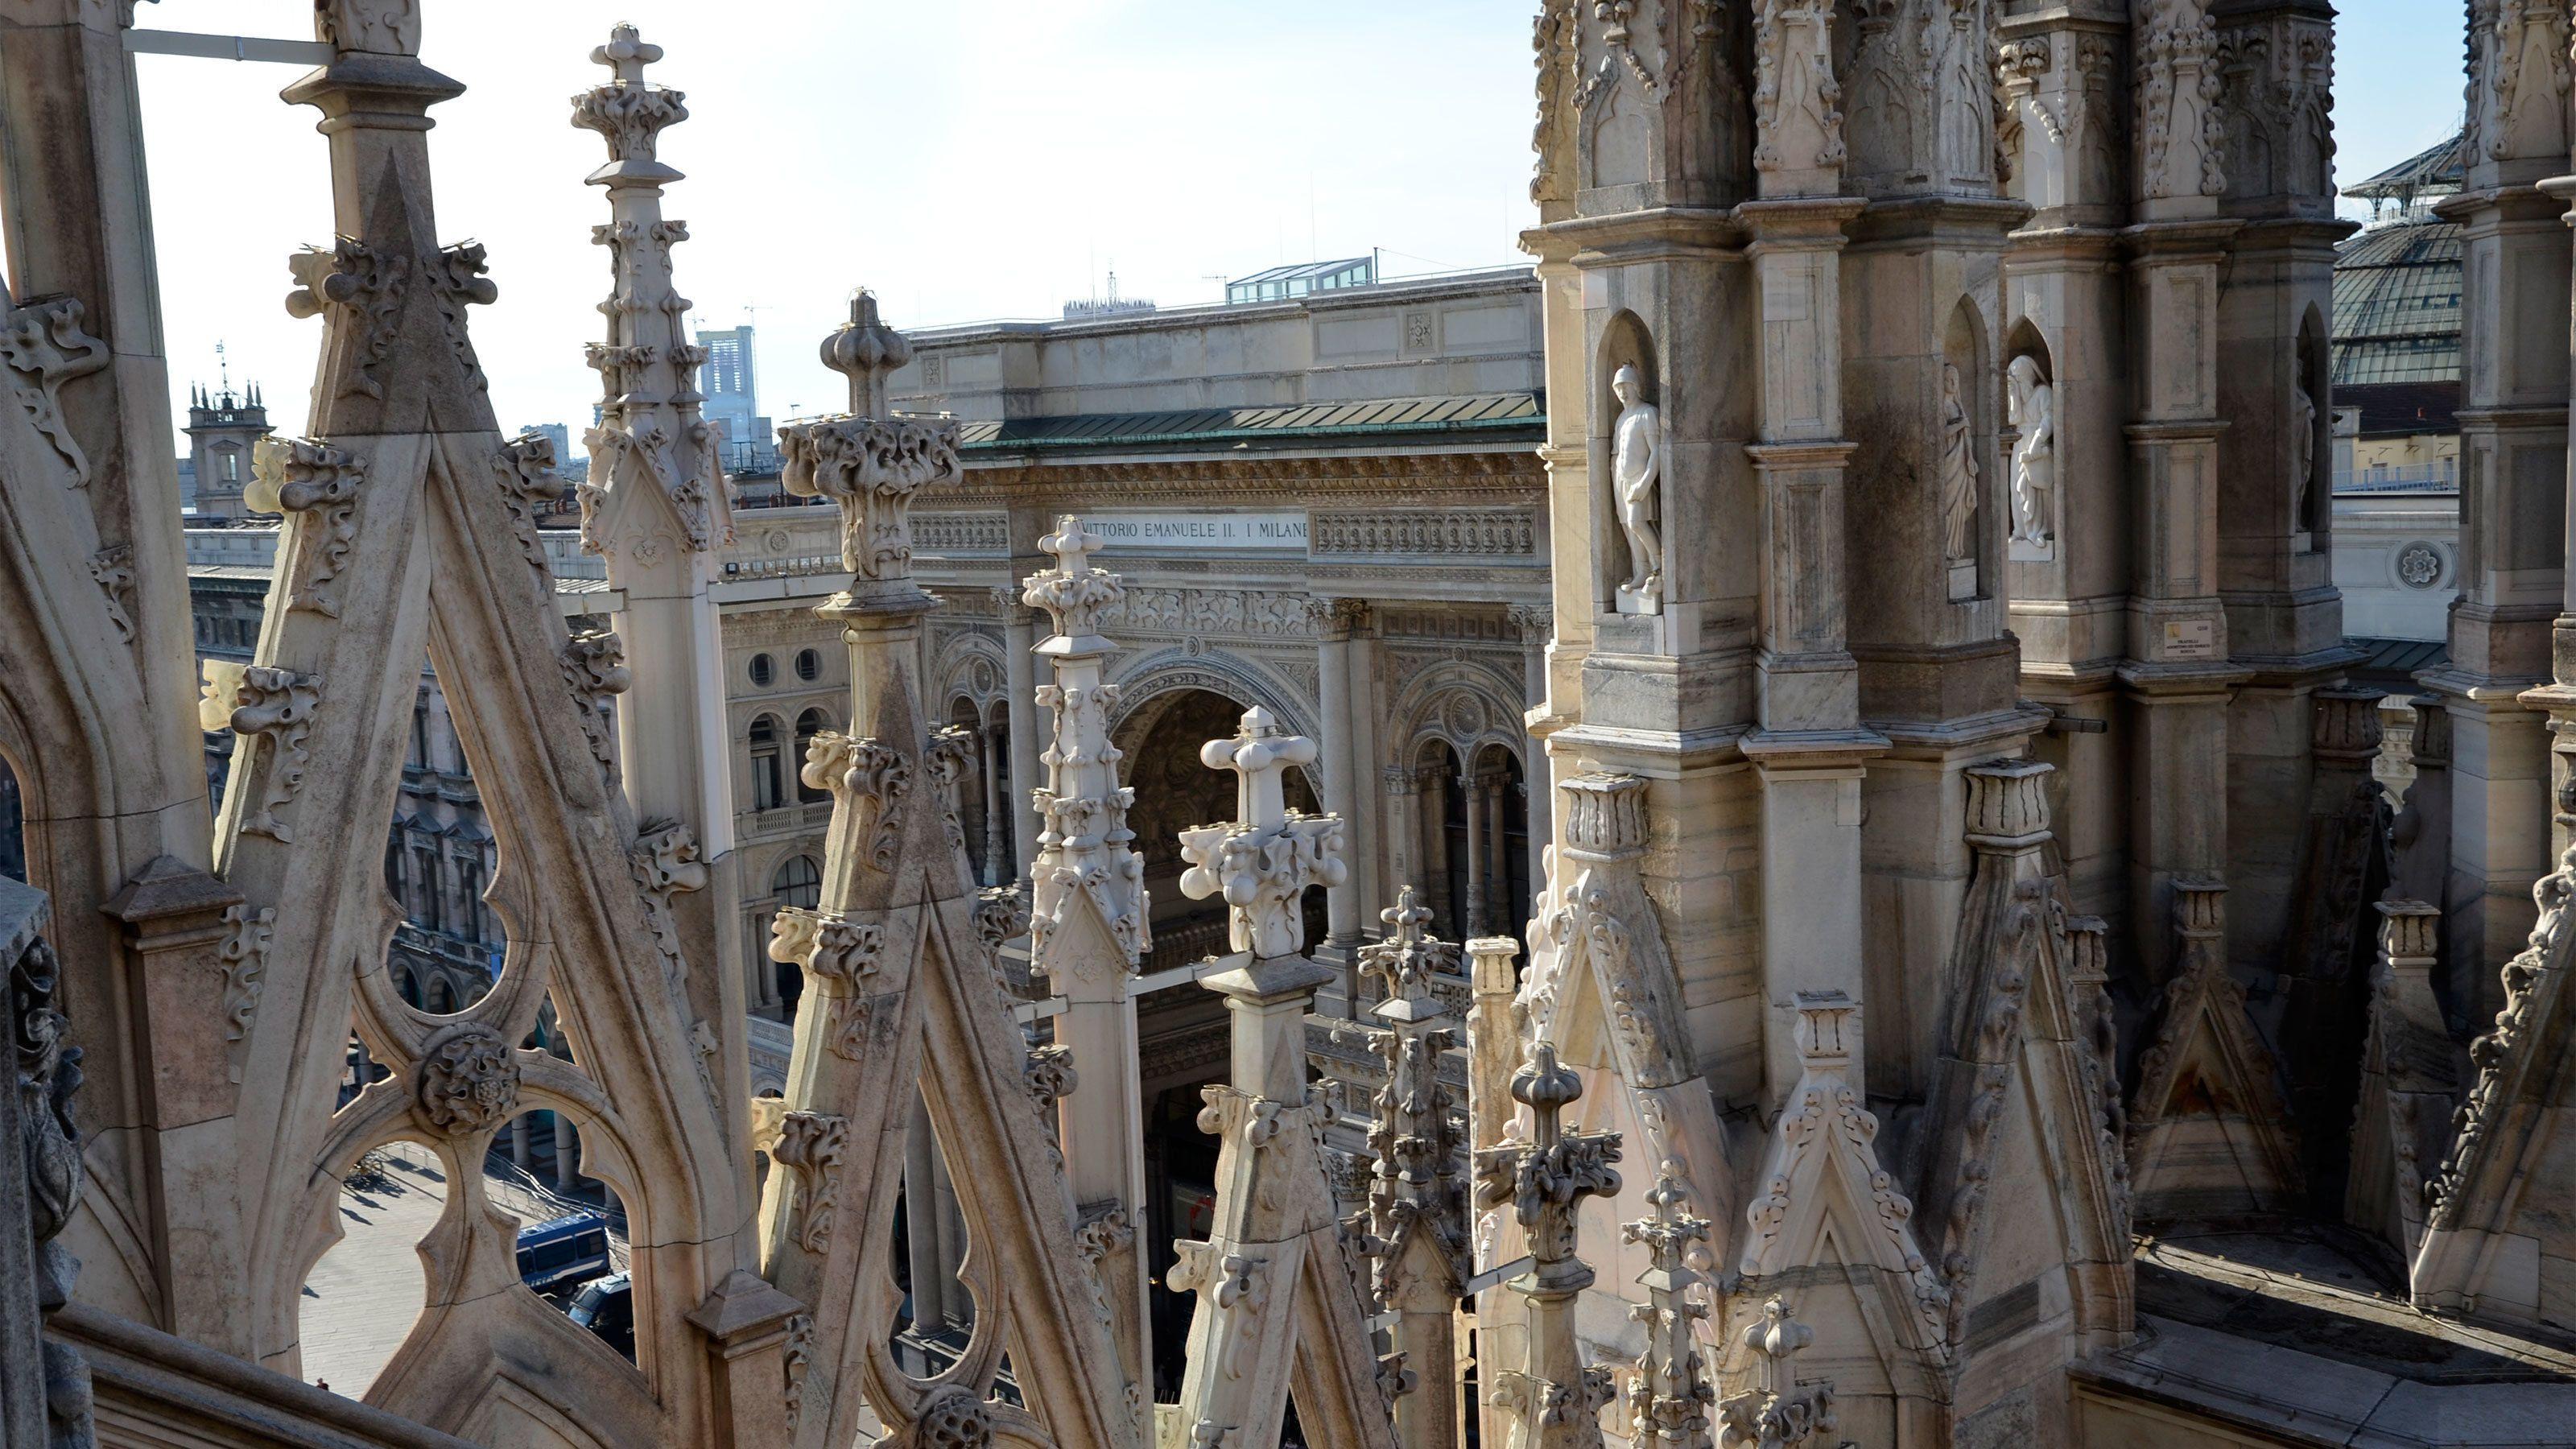 Building architecture closeup in Milan